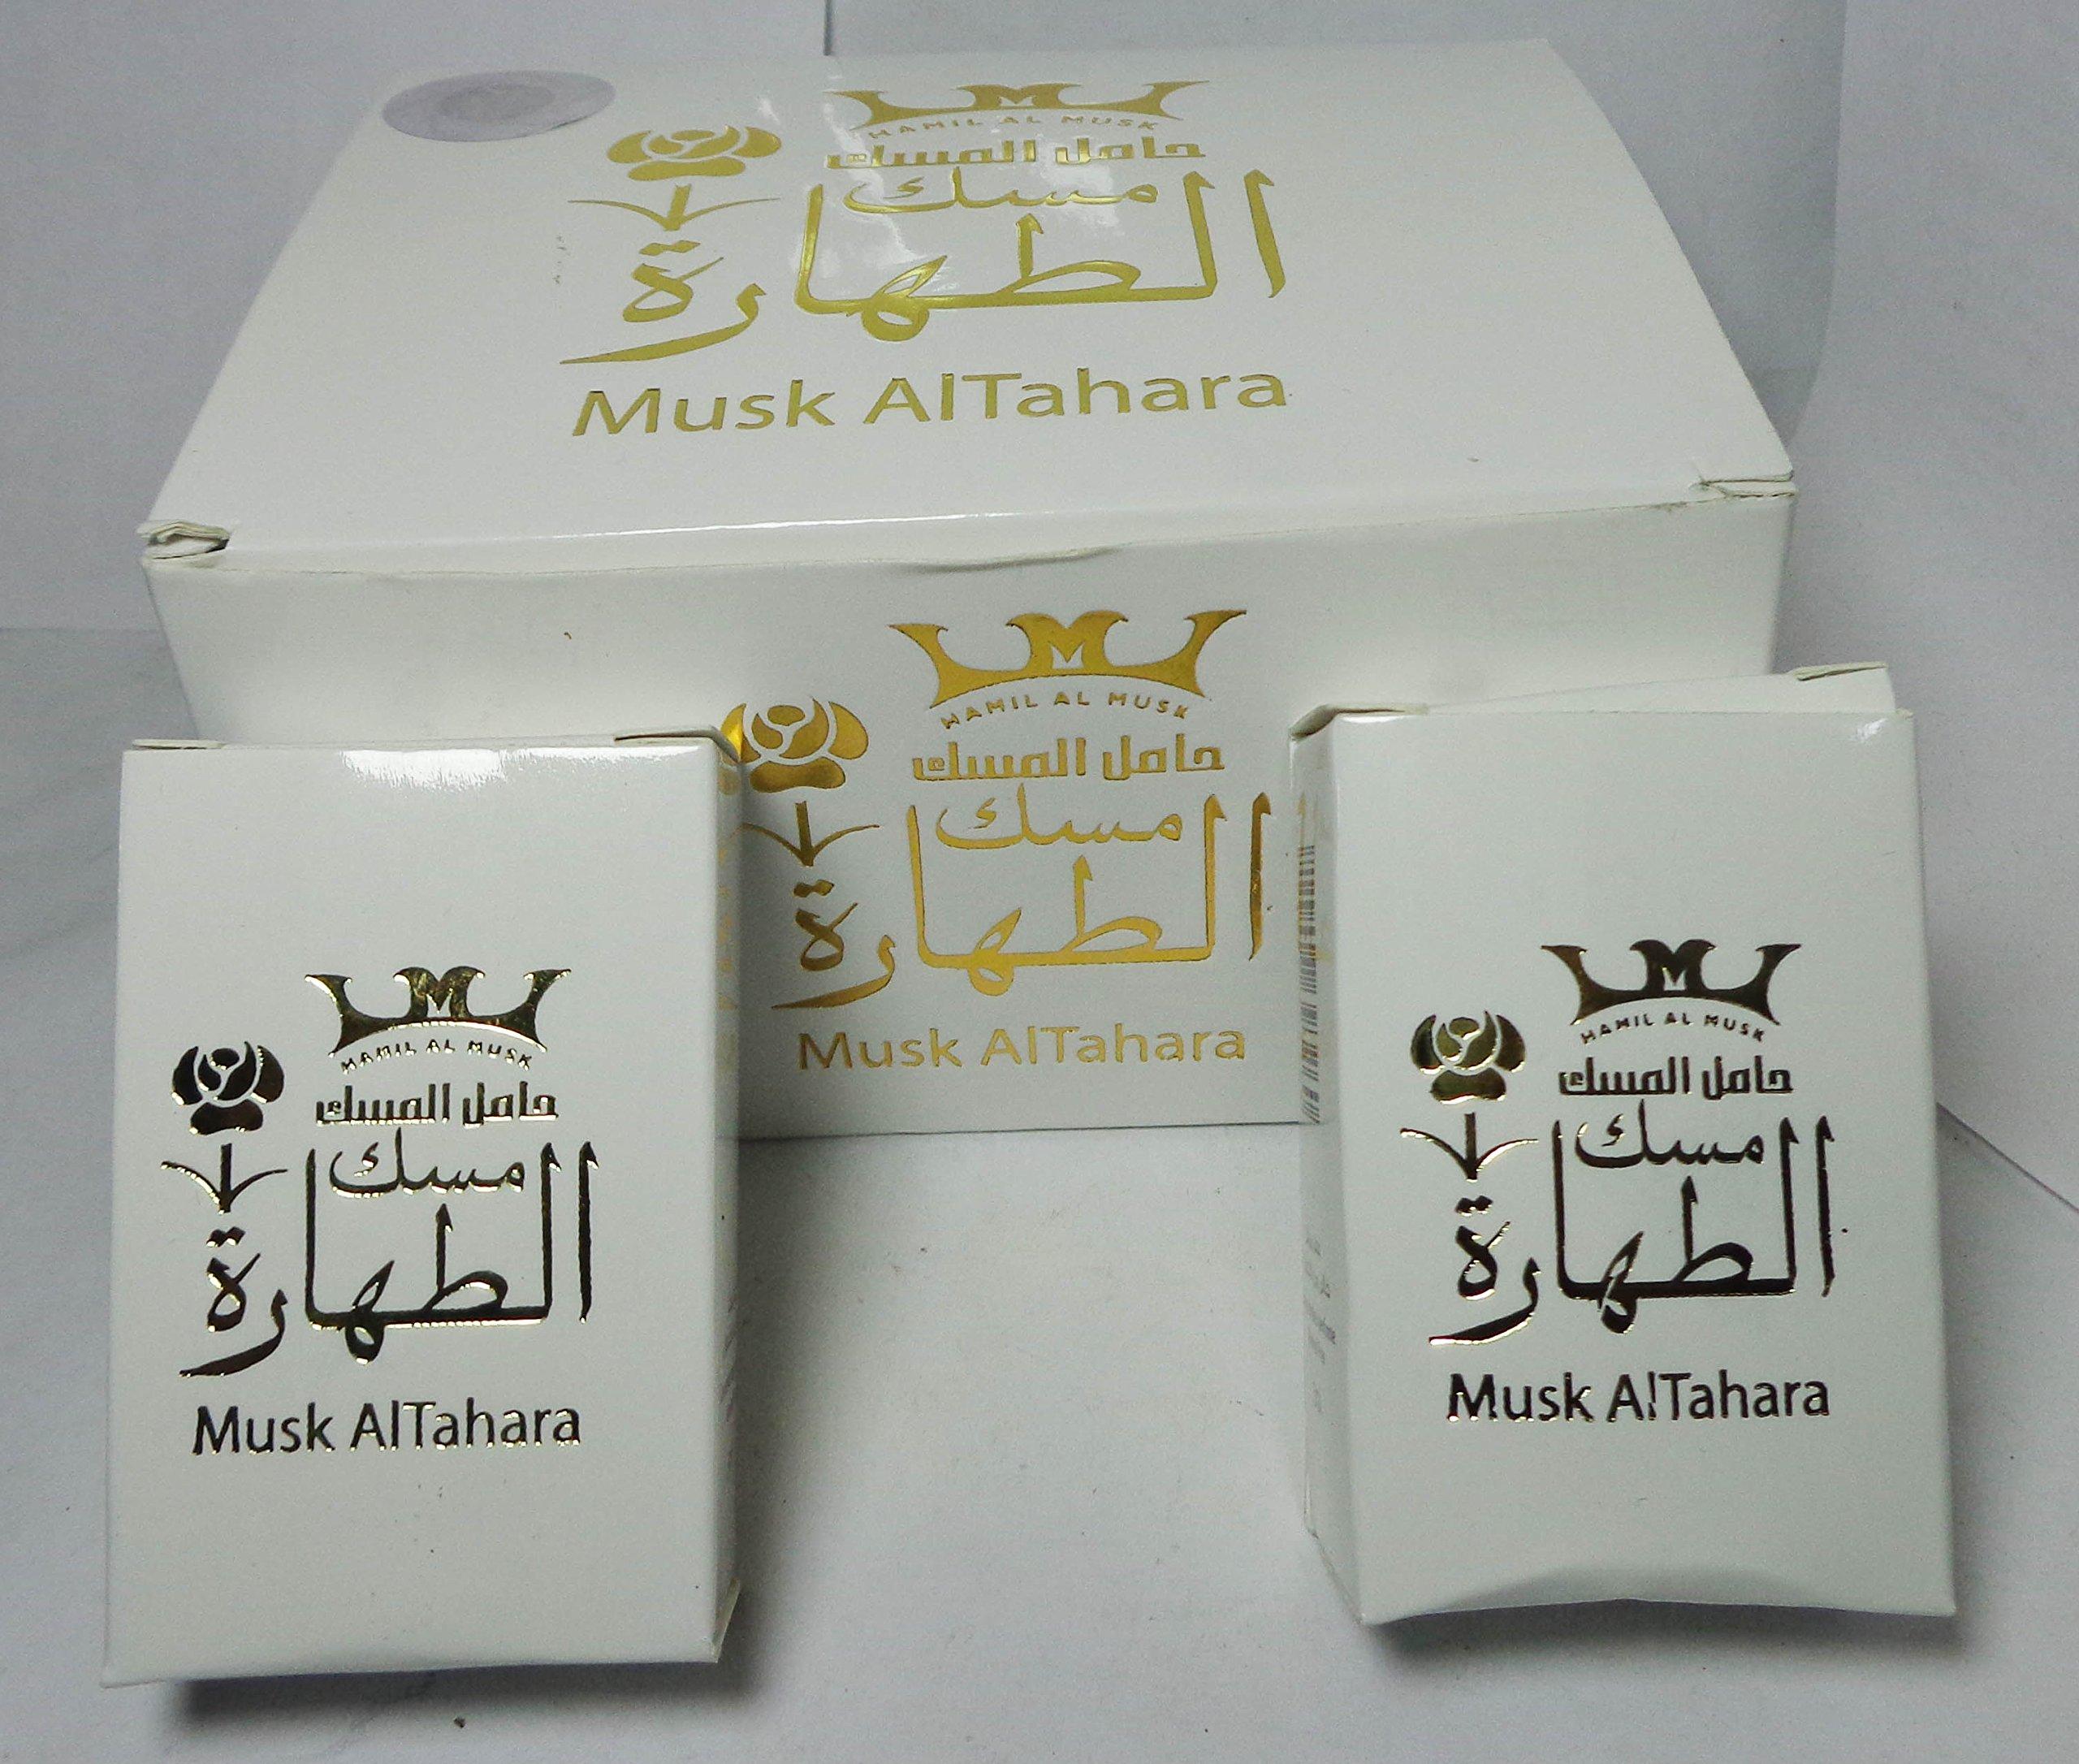 Pure Saudi Arabian Musk Al tahara Altahara Alcohol Free 5ml مسك أبيــض درجة أولى (12 Bottle = 60 ml) by bonballoon (Image #4)